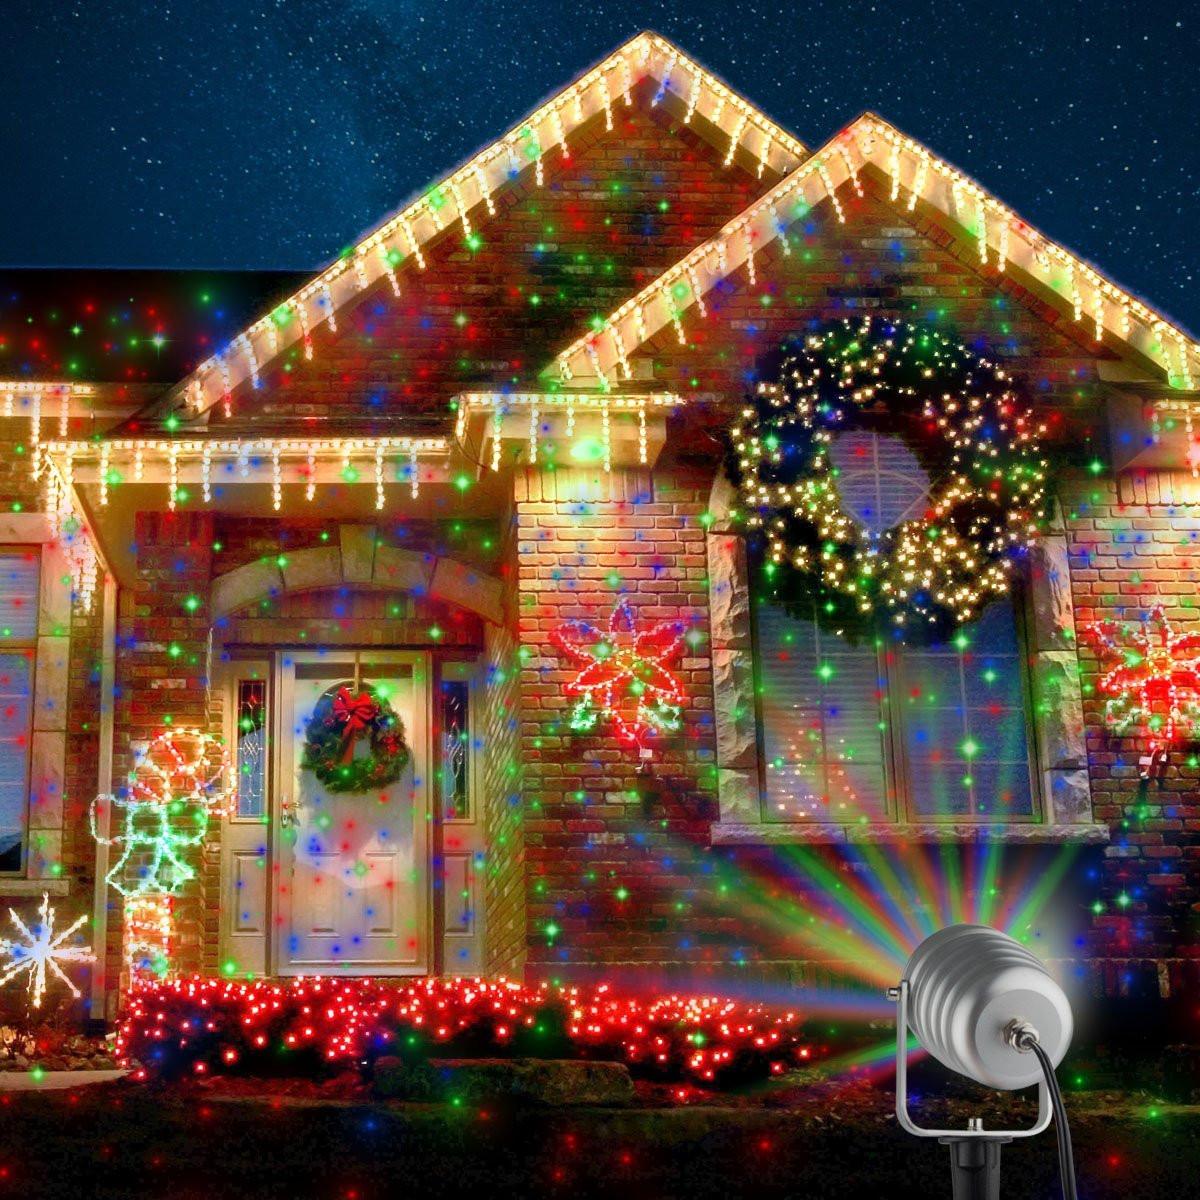 Outdoor Christmas Laser Lights  Outdoor Christmas Laser Projector Motion Lights $53 99